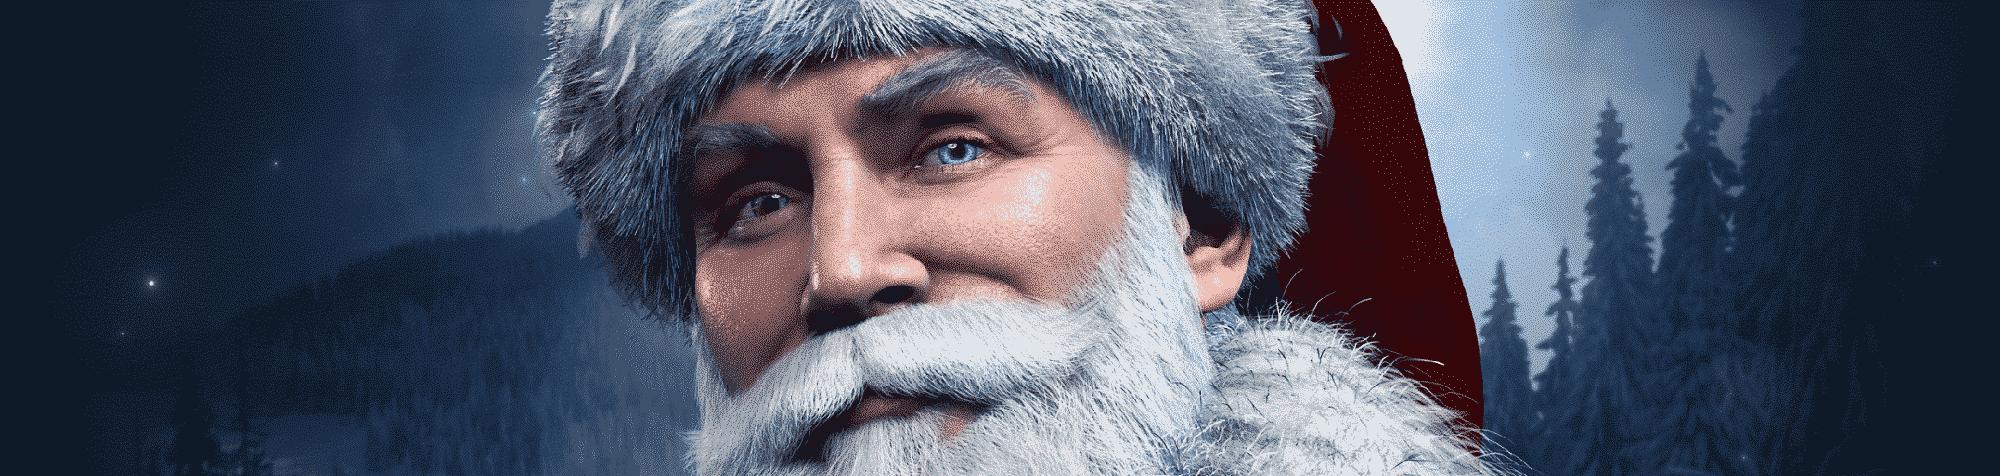 CLIENT TESTIMONIAL: ENCHANT CHRISTMAS